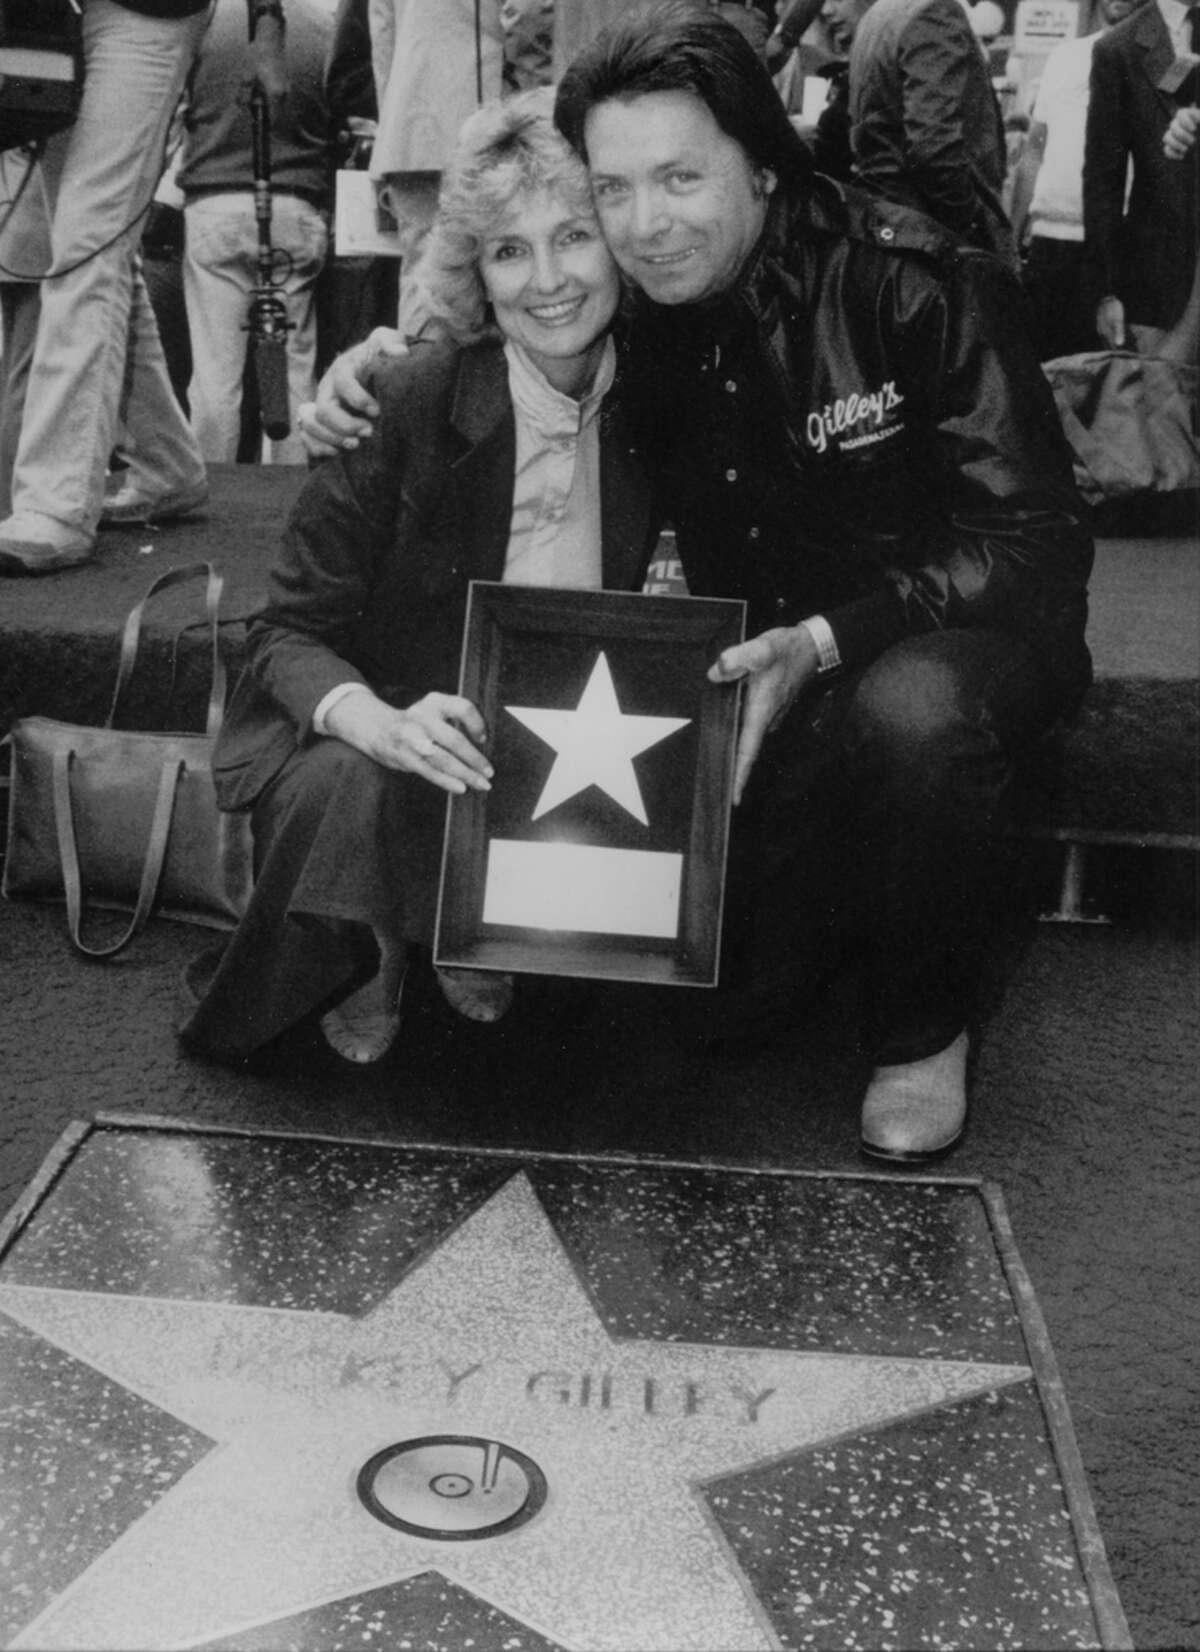 Vivian and Mickey Gilley